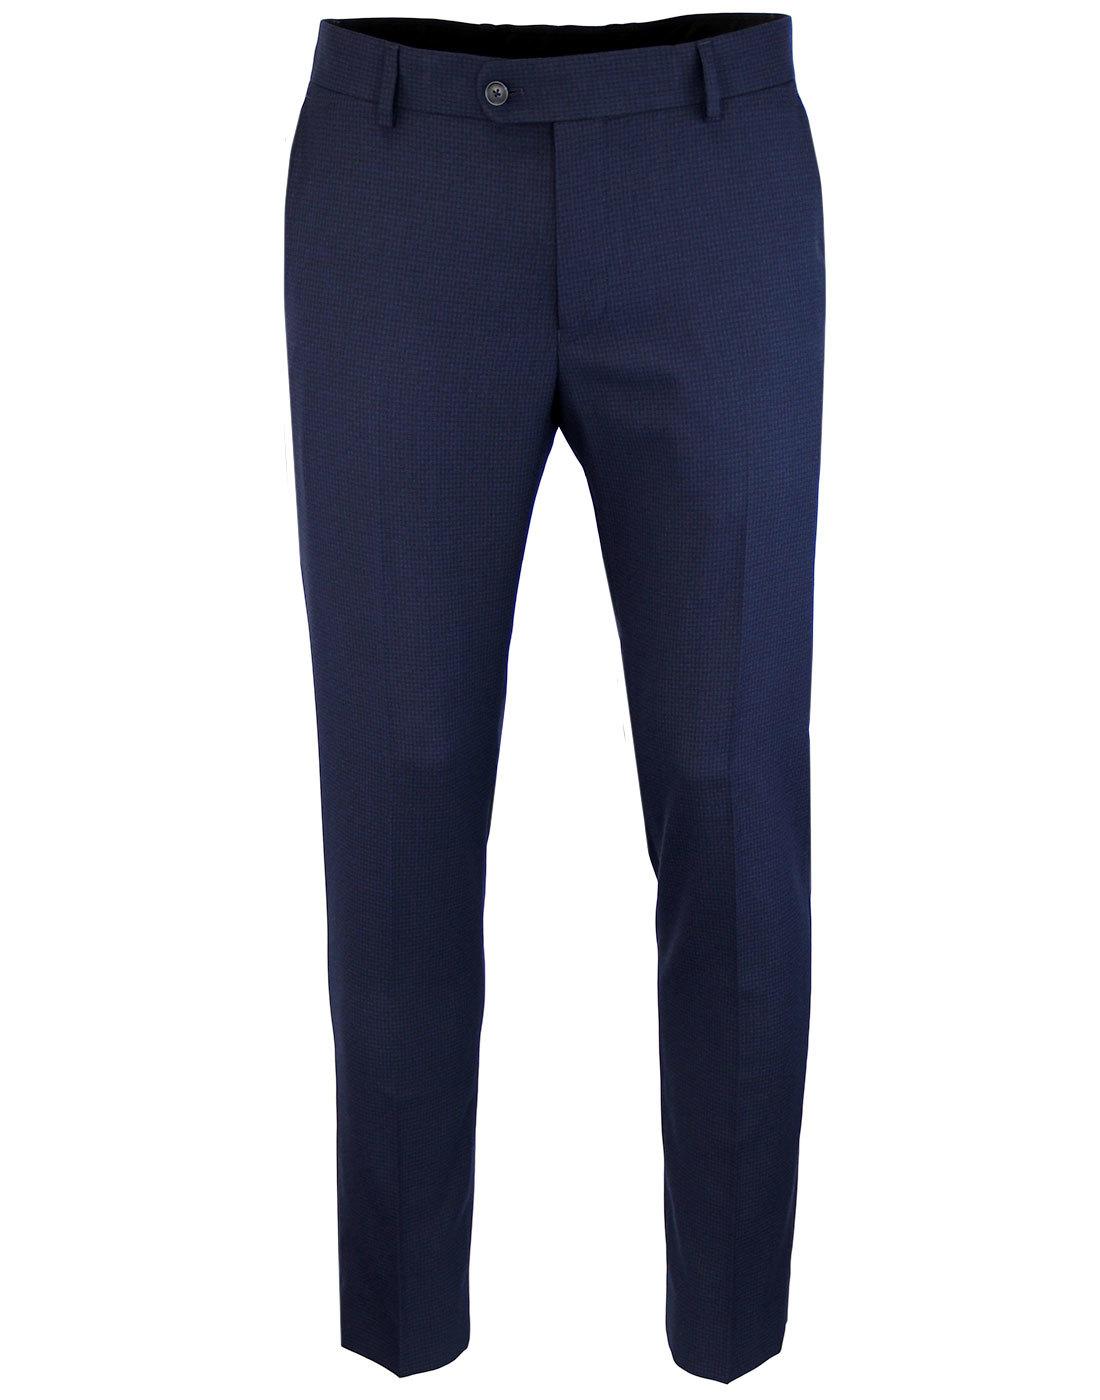 Men's Retro 1960s Mod Puppytooth Suit Trousers